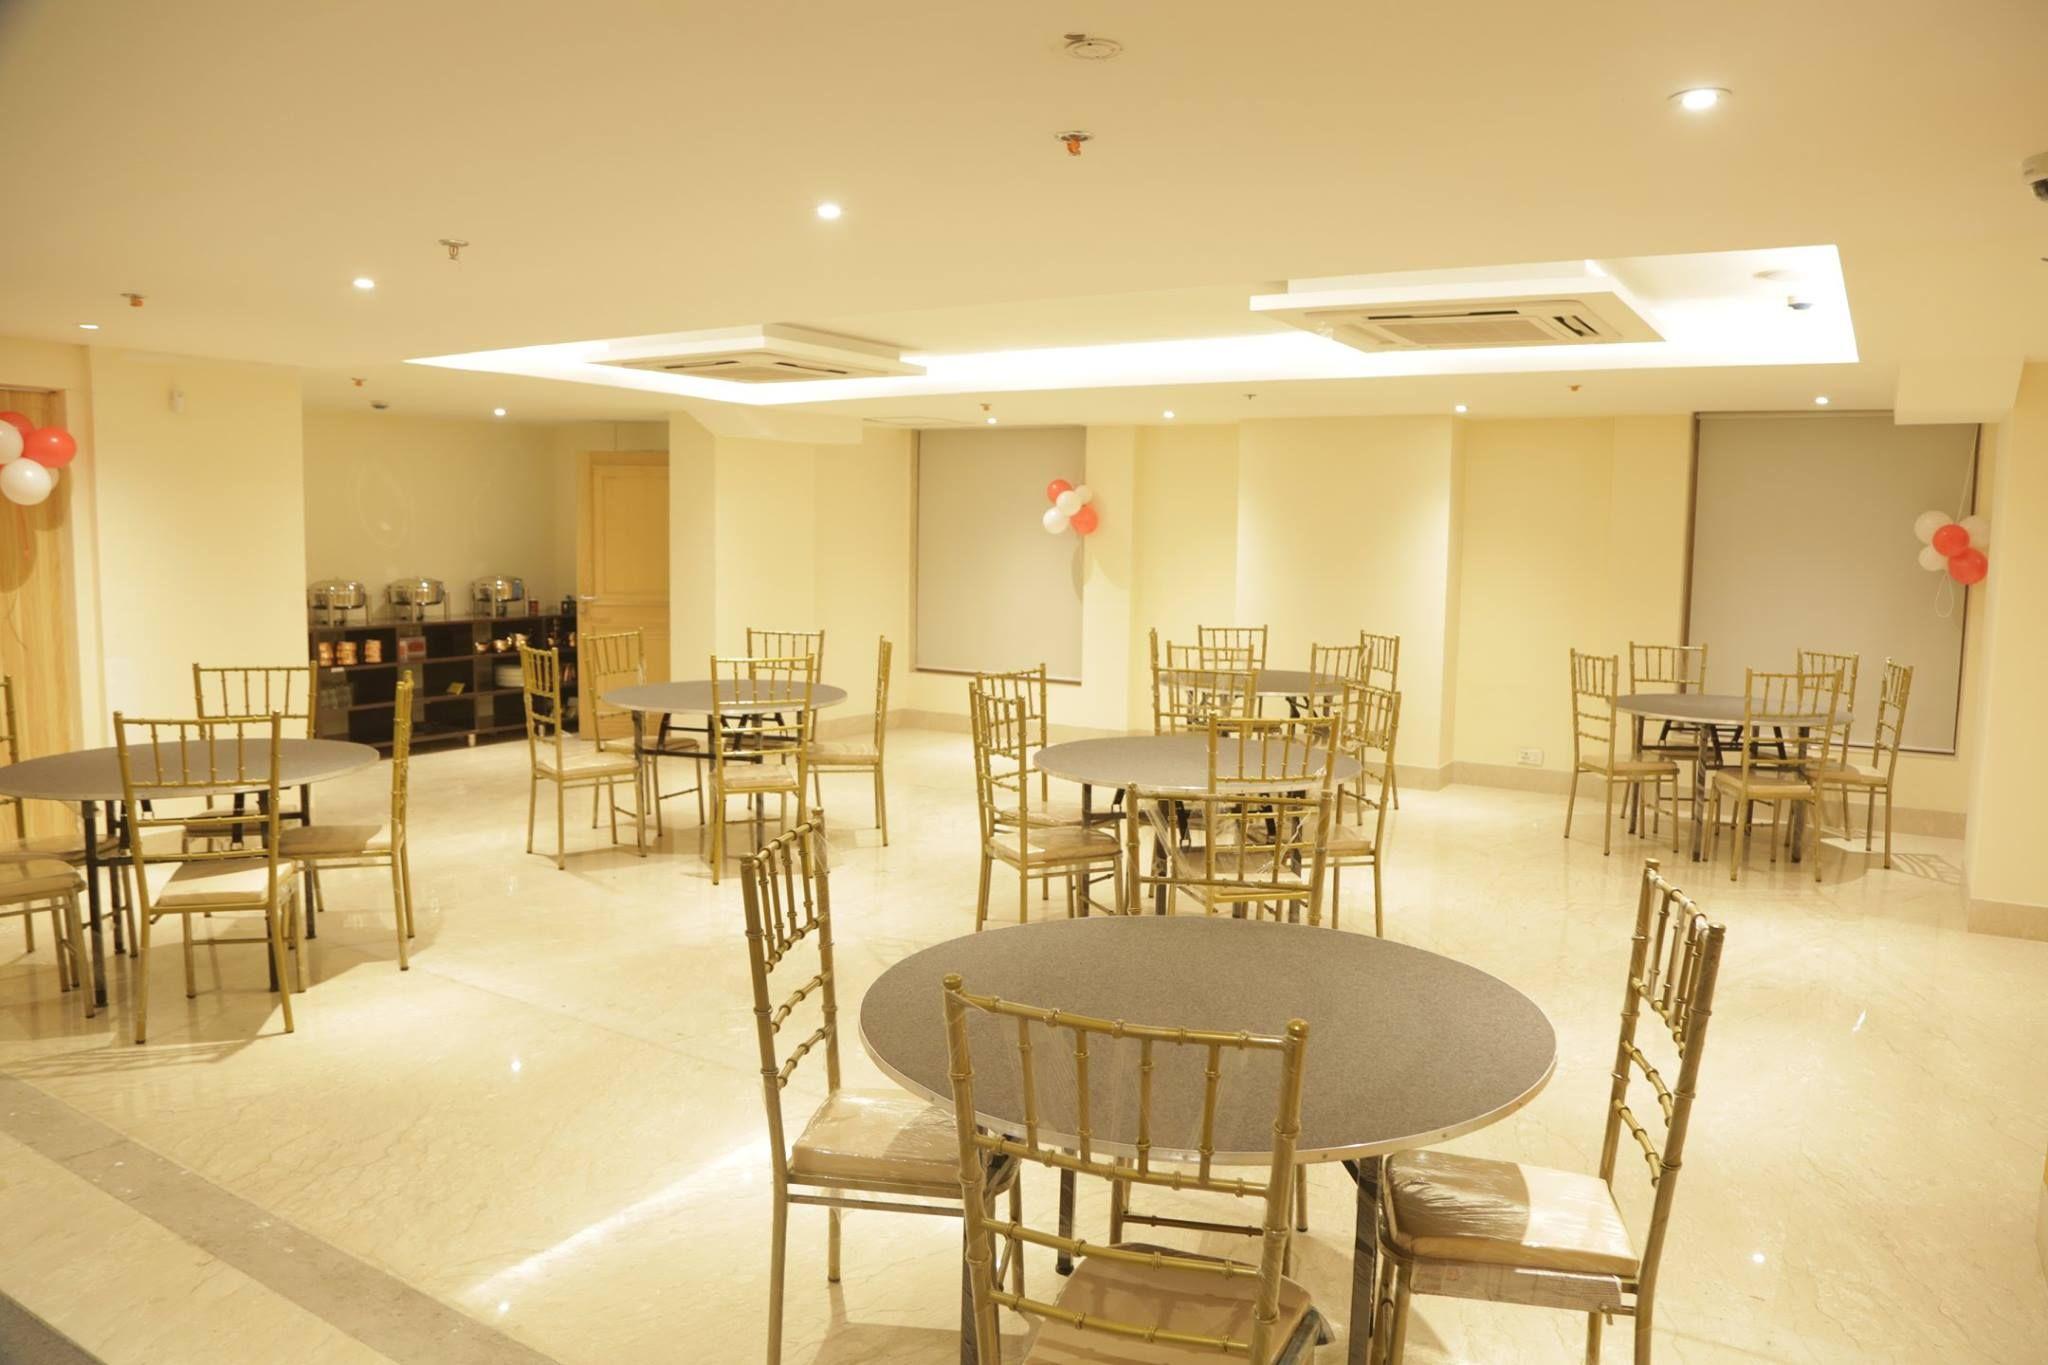 Hotel in South Delhi, New Delhi Hotels, Best Hotels in